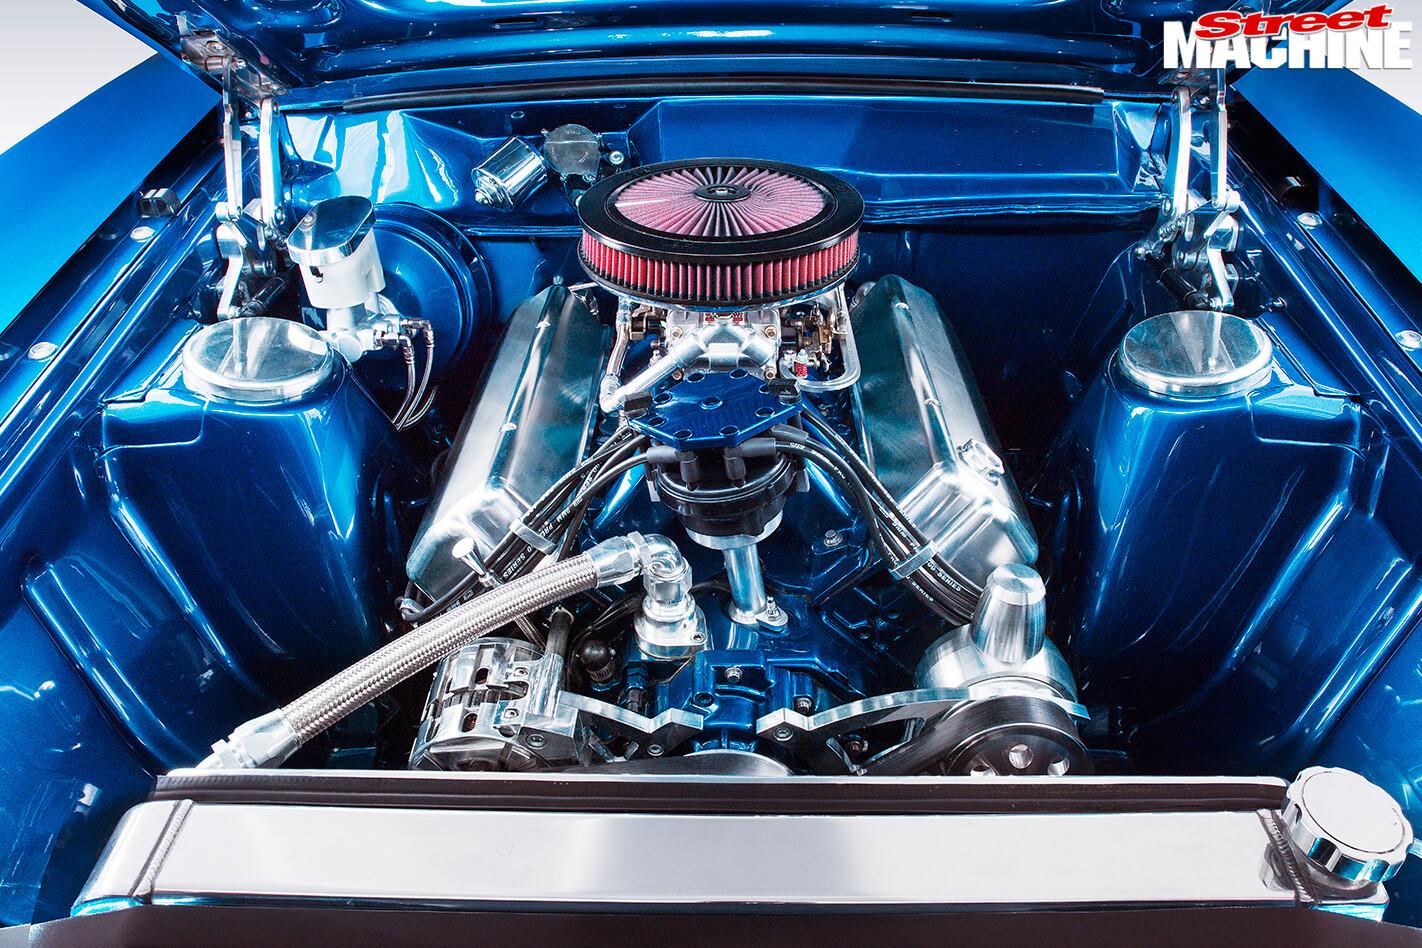 Ford -XB-Falcon -Fairmont -GS-engine -bay